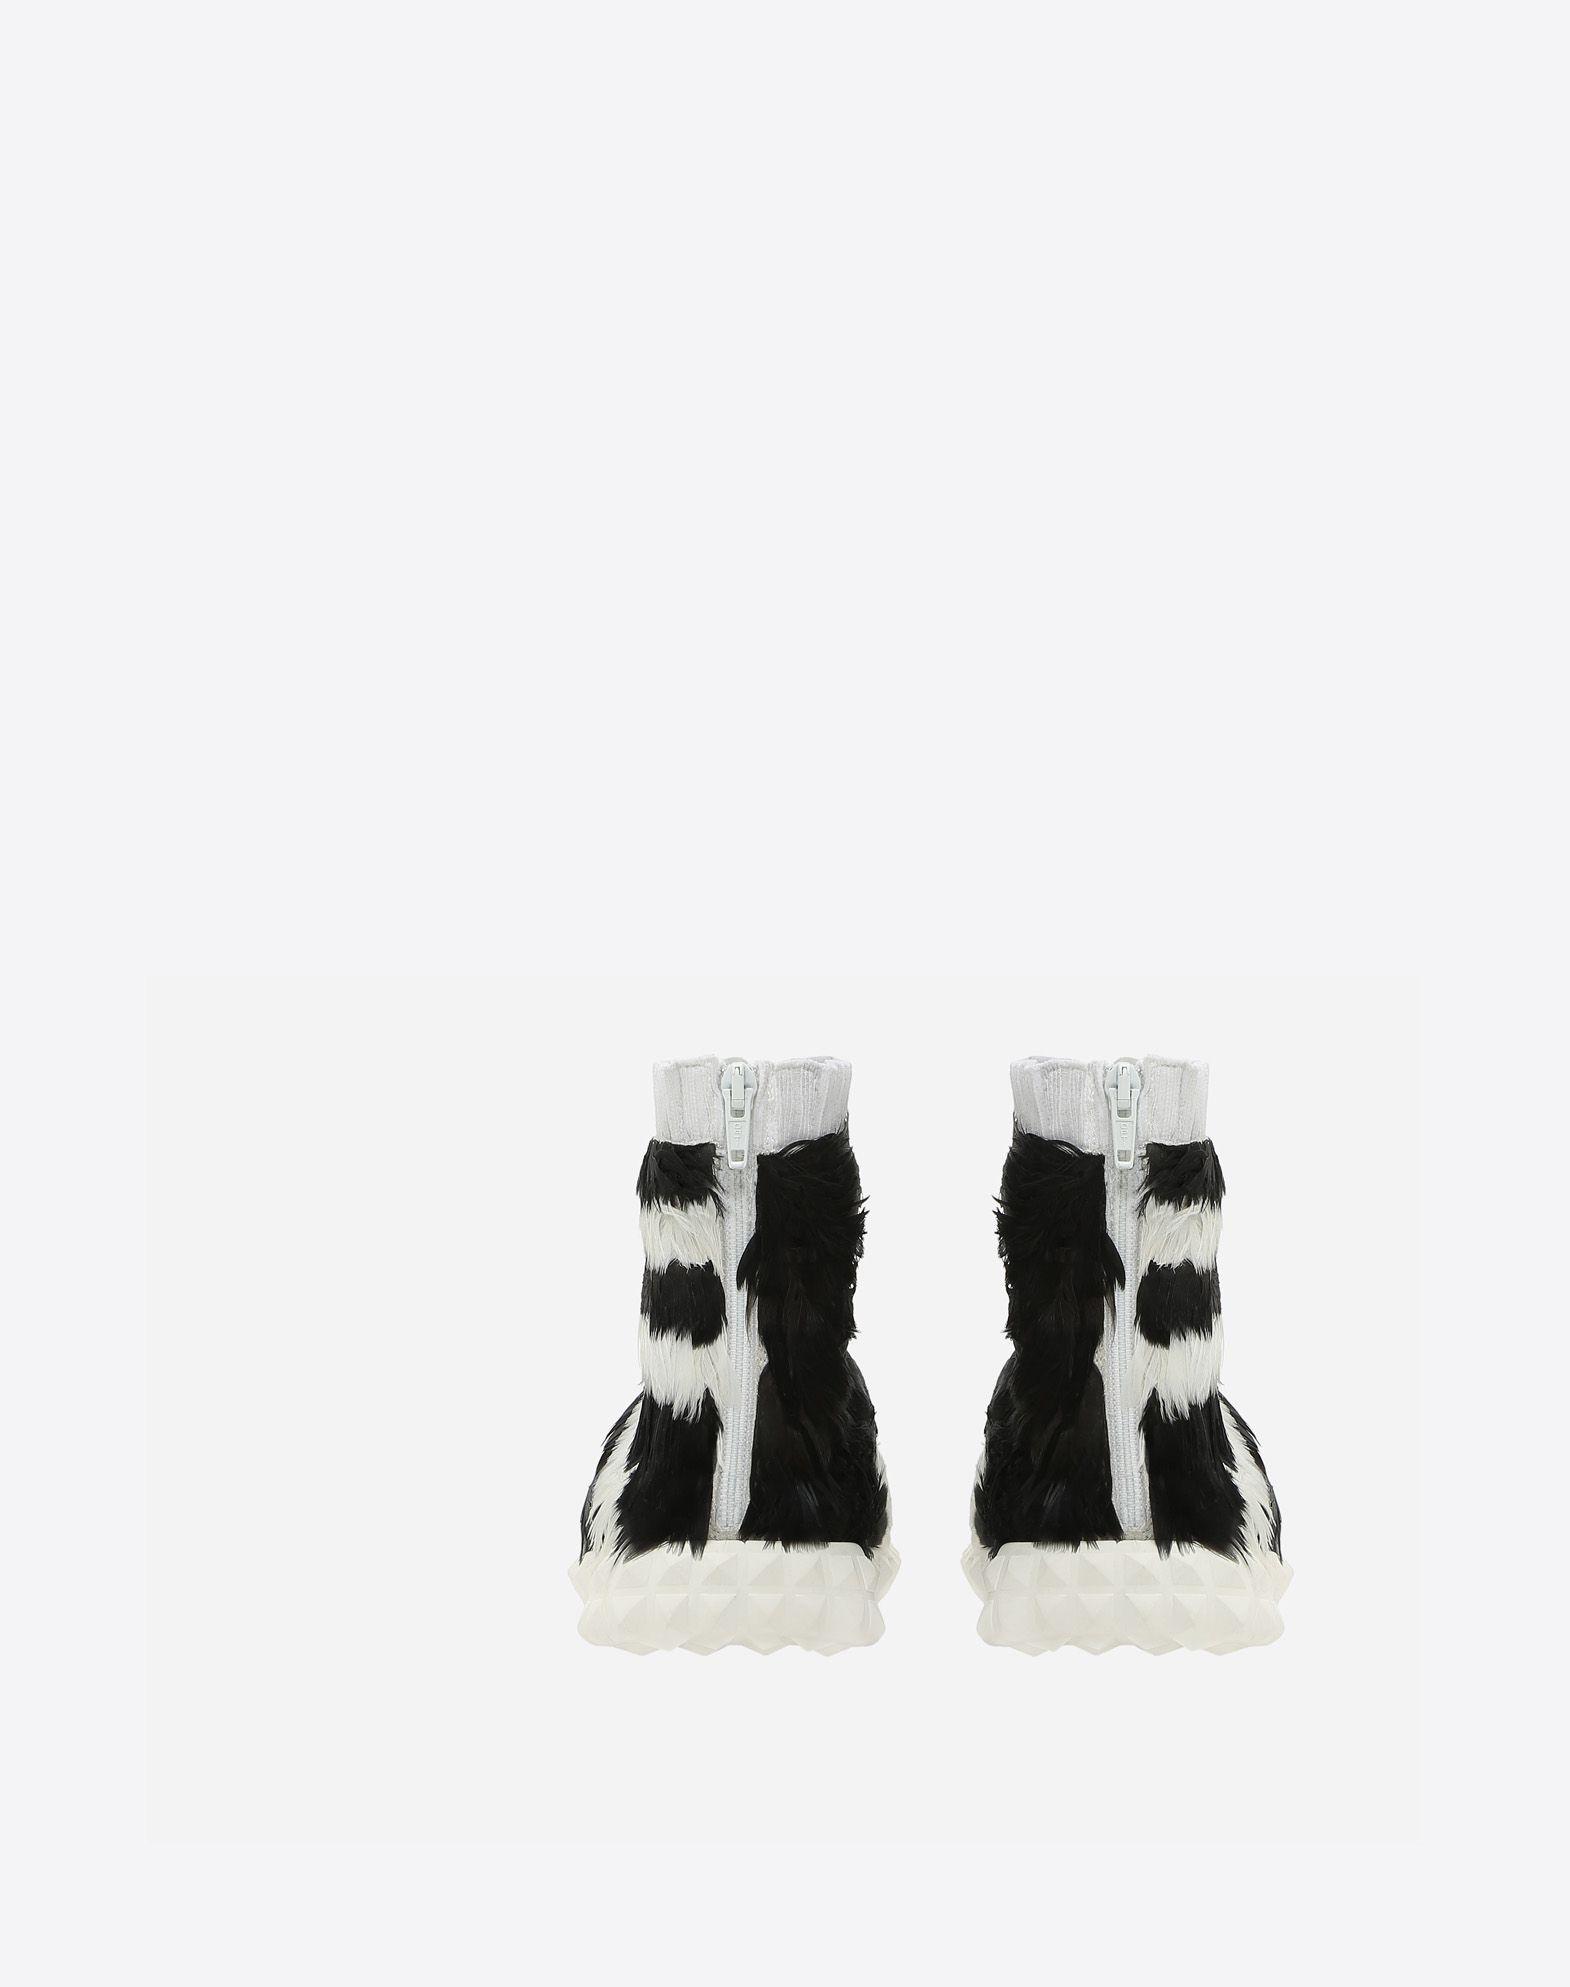 VALENTINO GARAVANI Sneakers con plumas SNEAKERS ALTAS D d